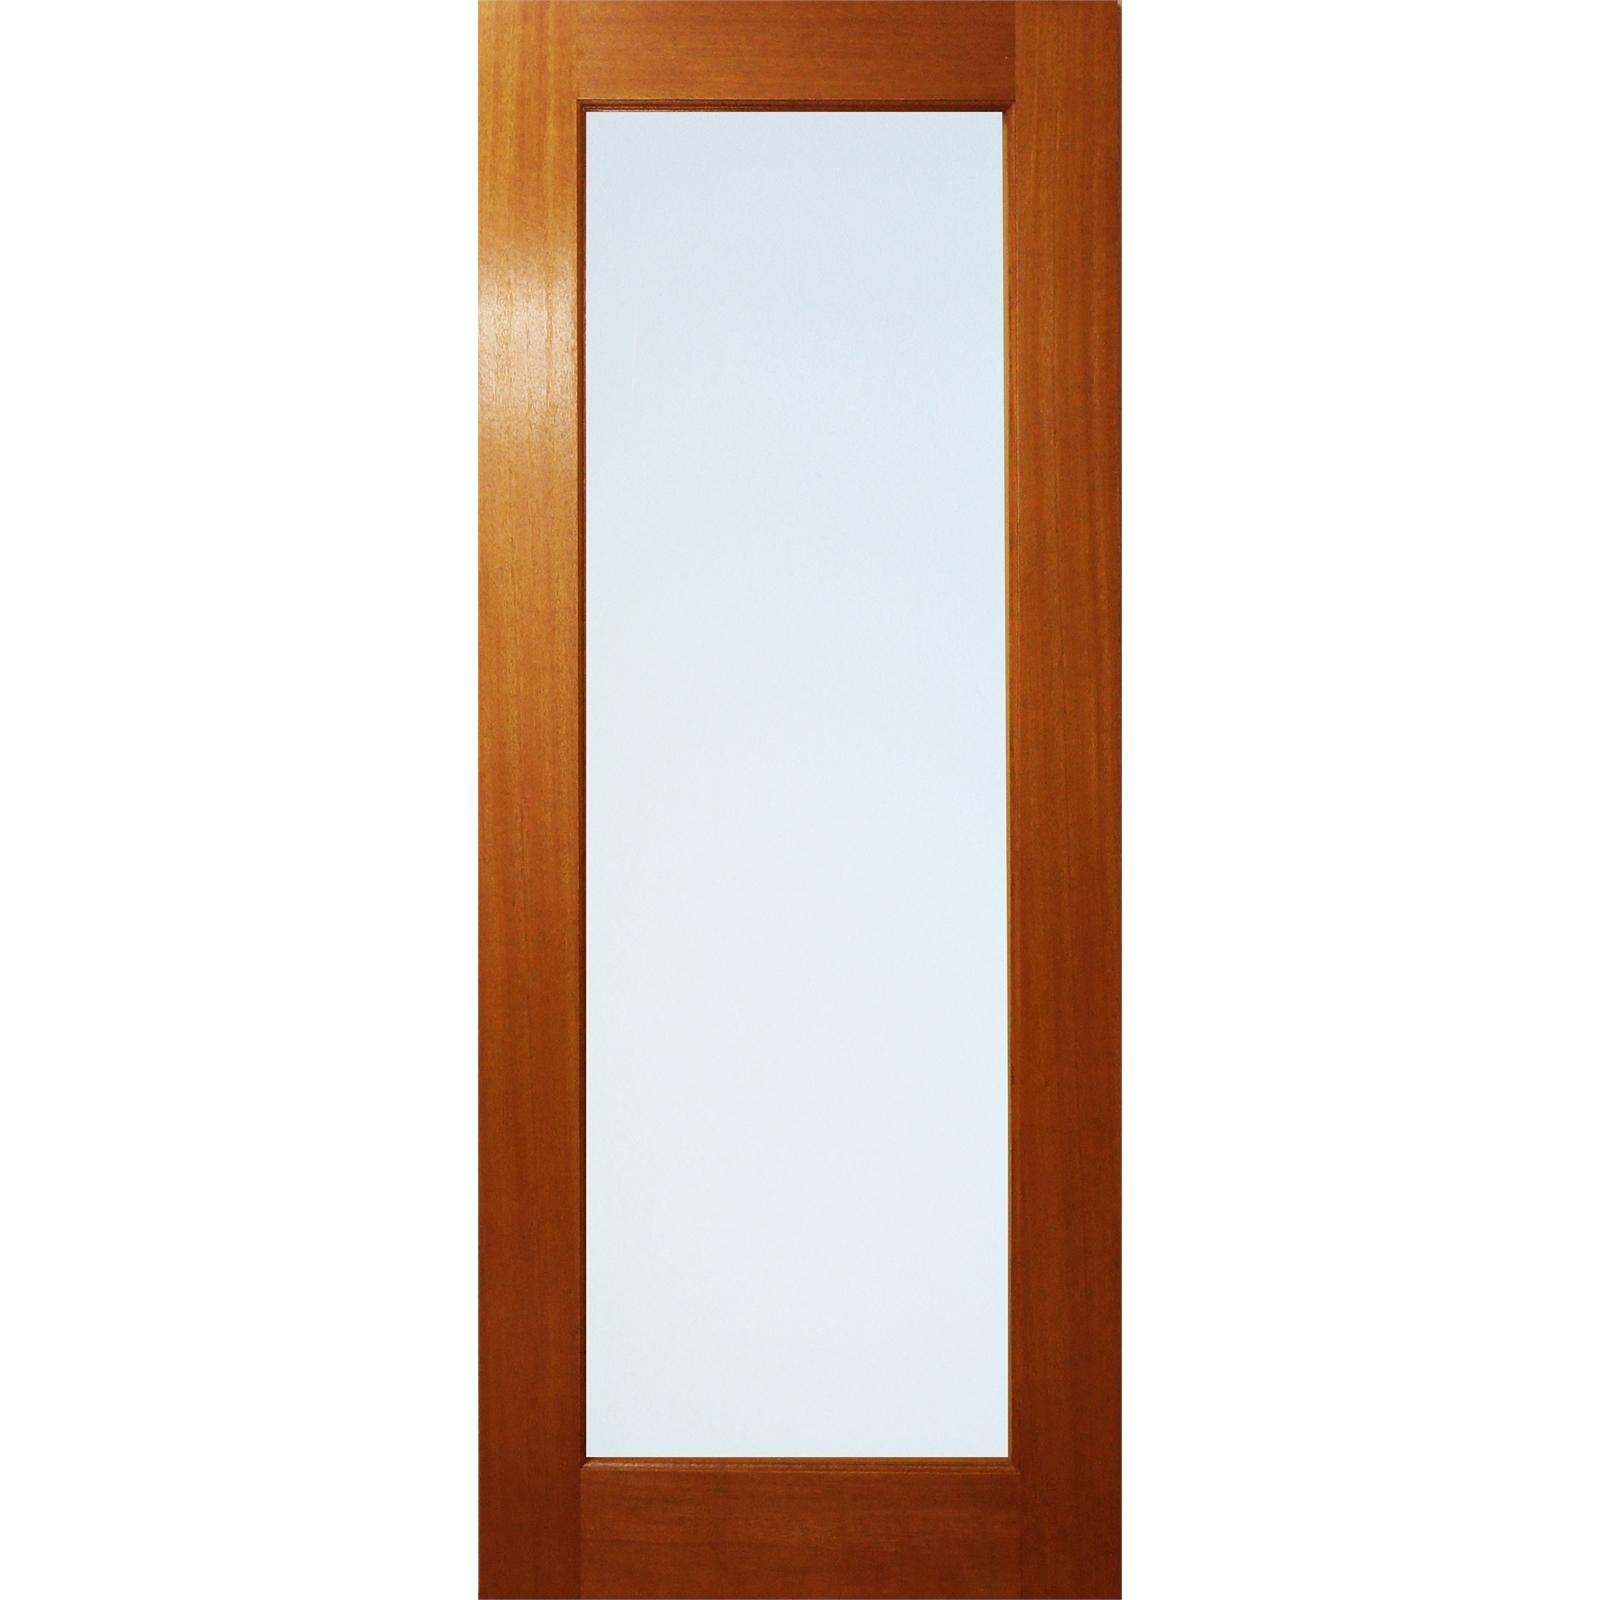 Woodcraft Doors 2040 x 820 x 35mm One Lite Frosted Laminated Glass Internal Door